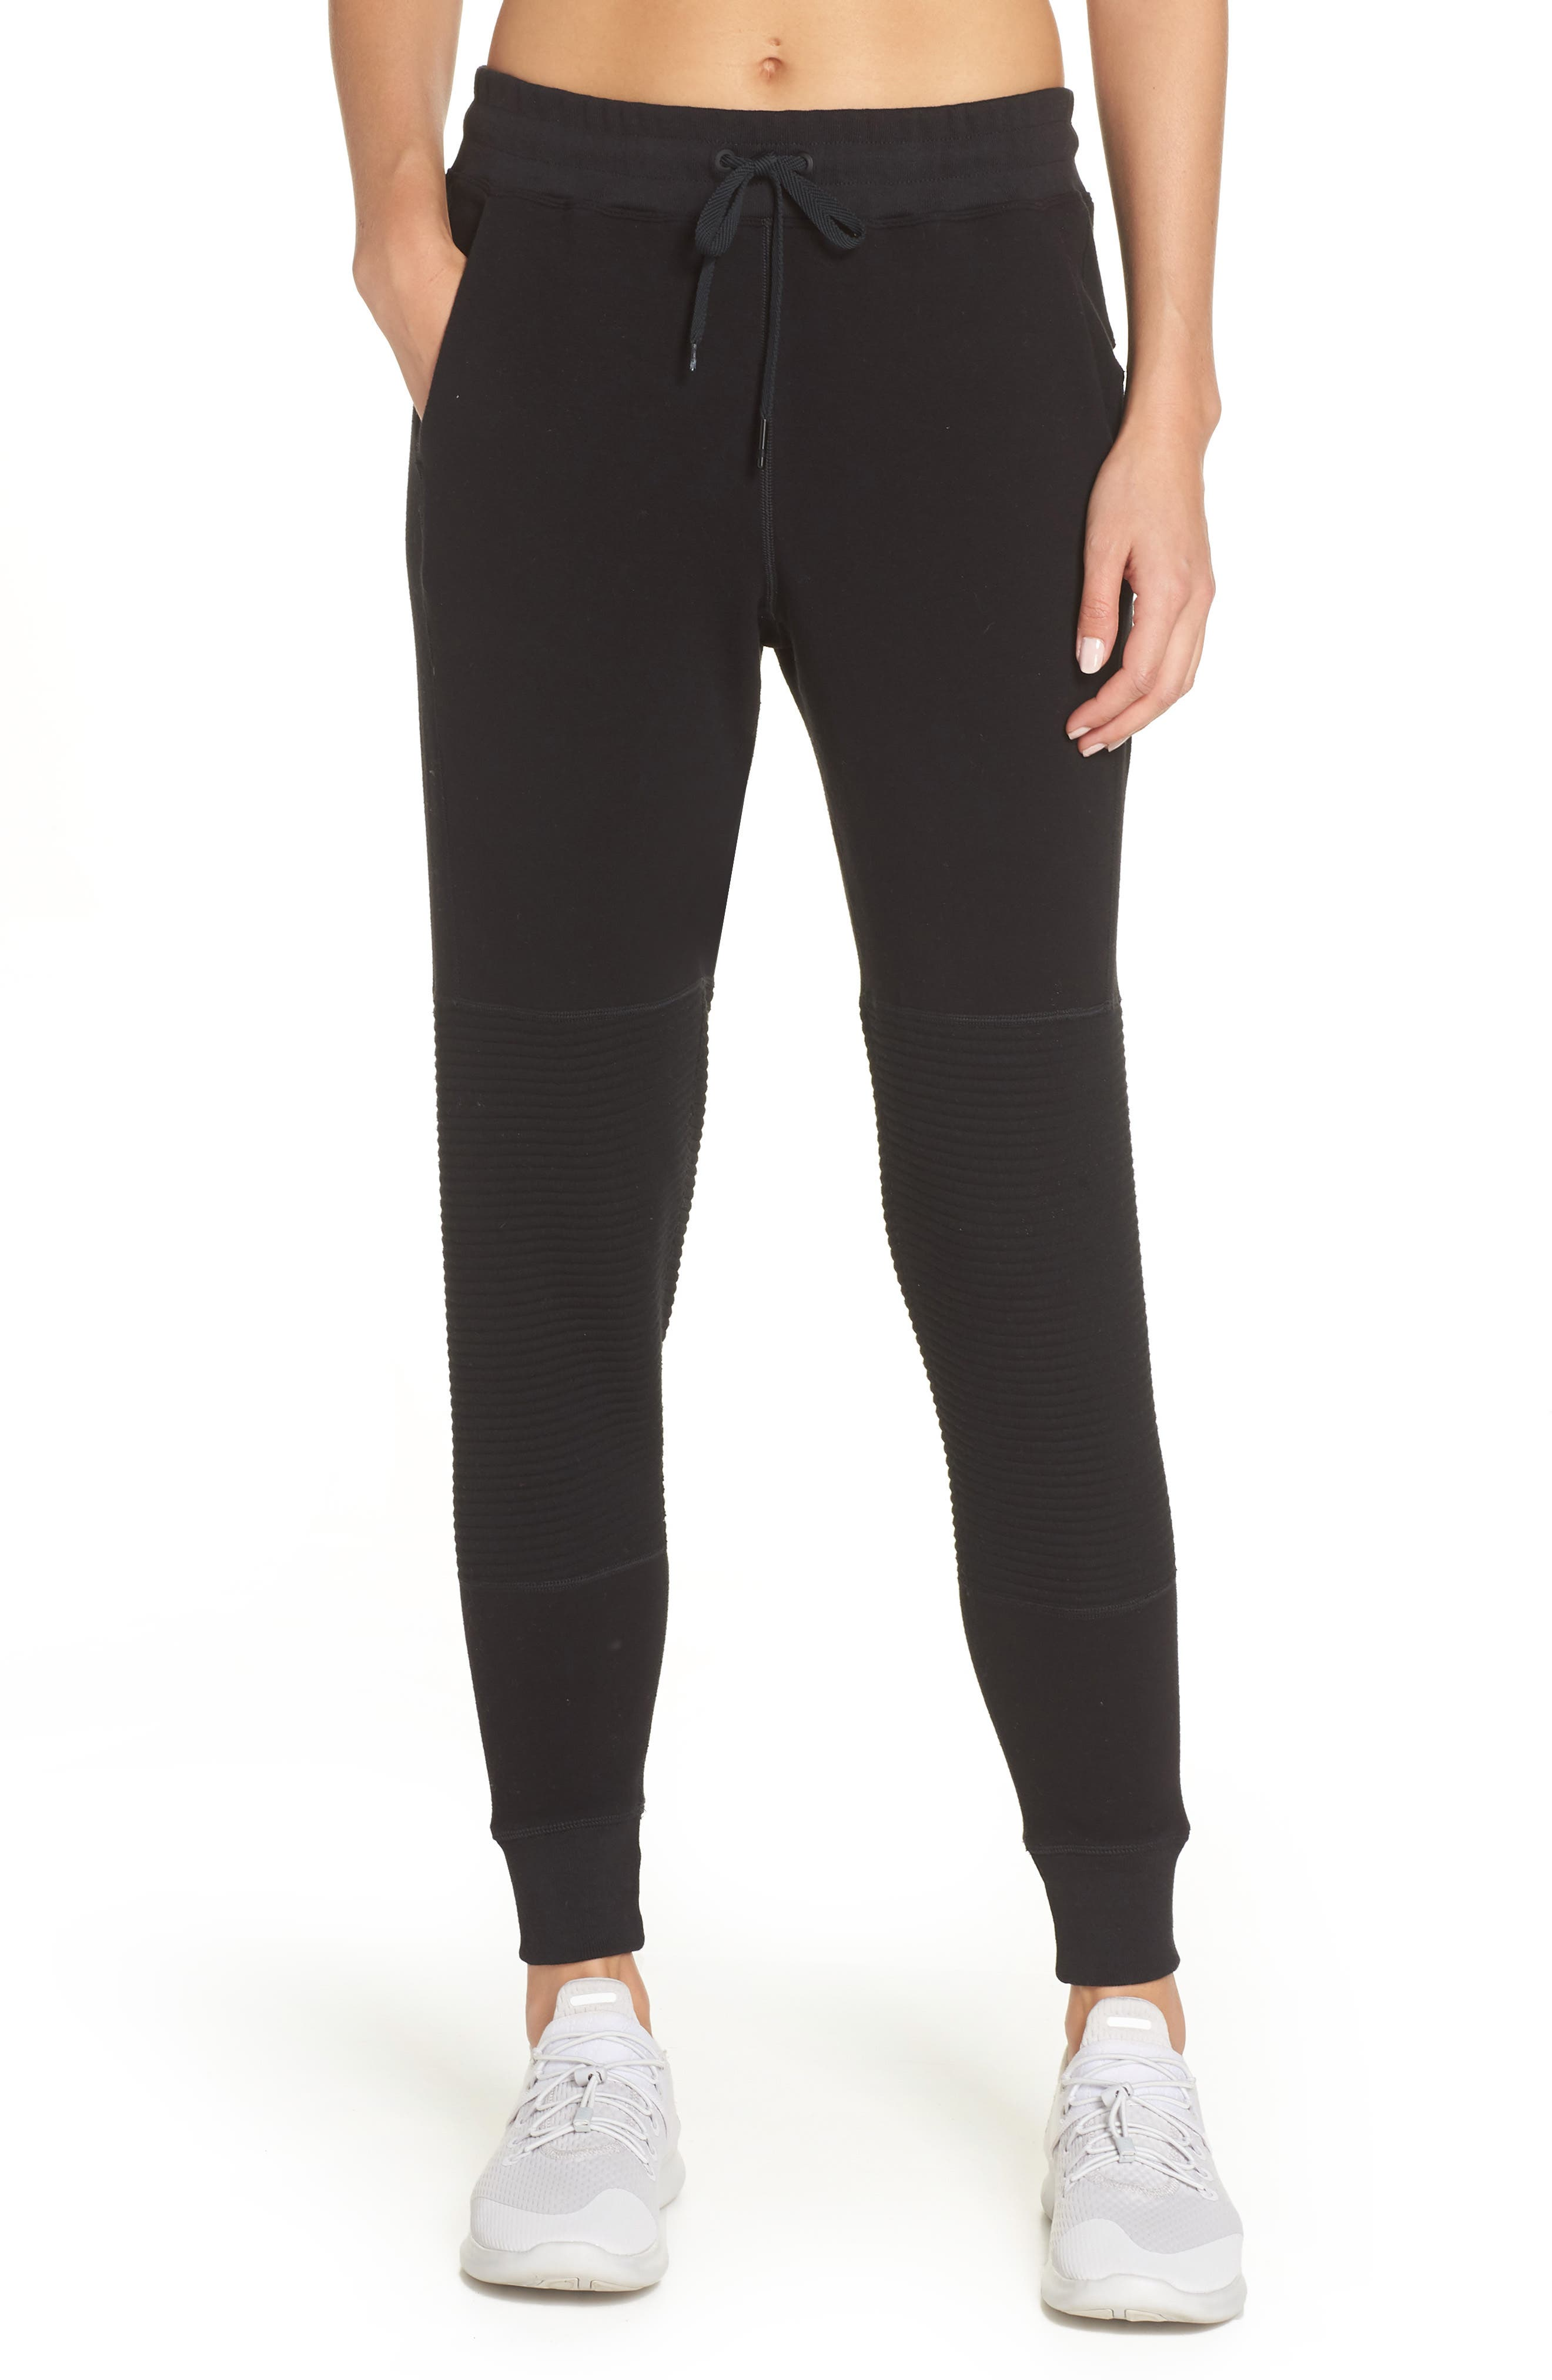 Moto Sweatpants,                             Main thumbnail 1, color,                             BLACK